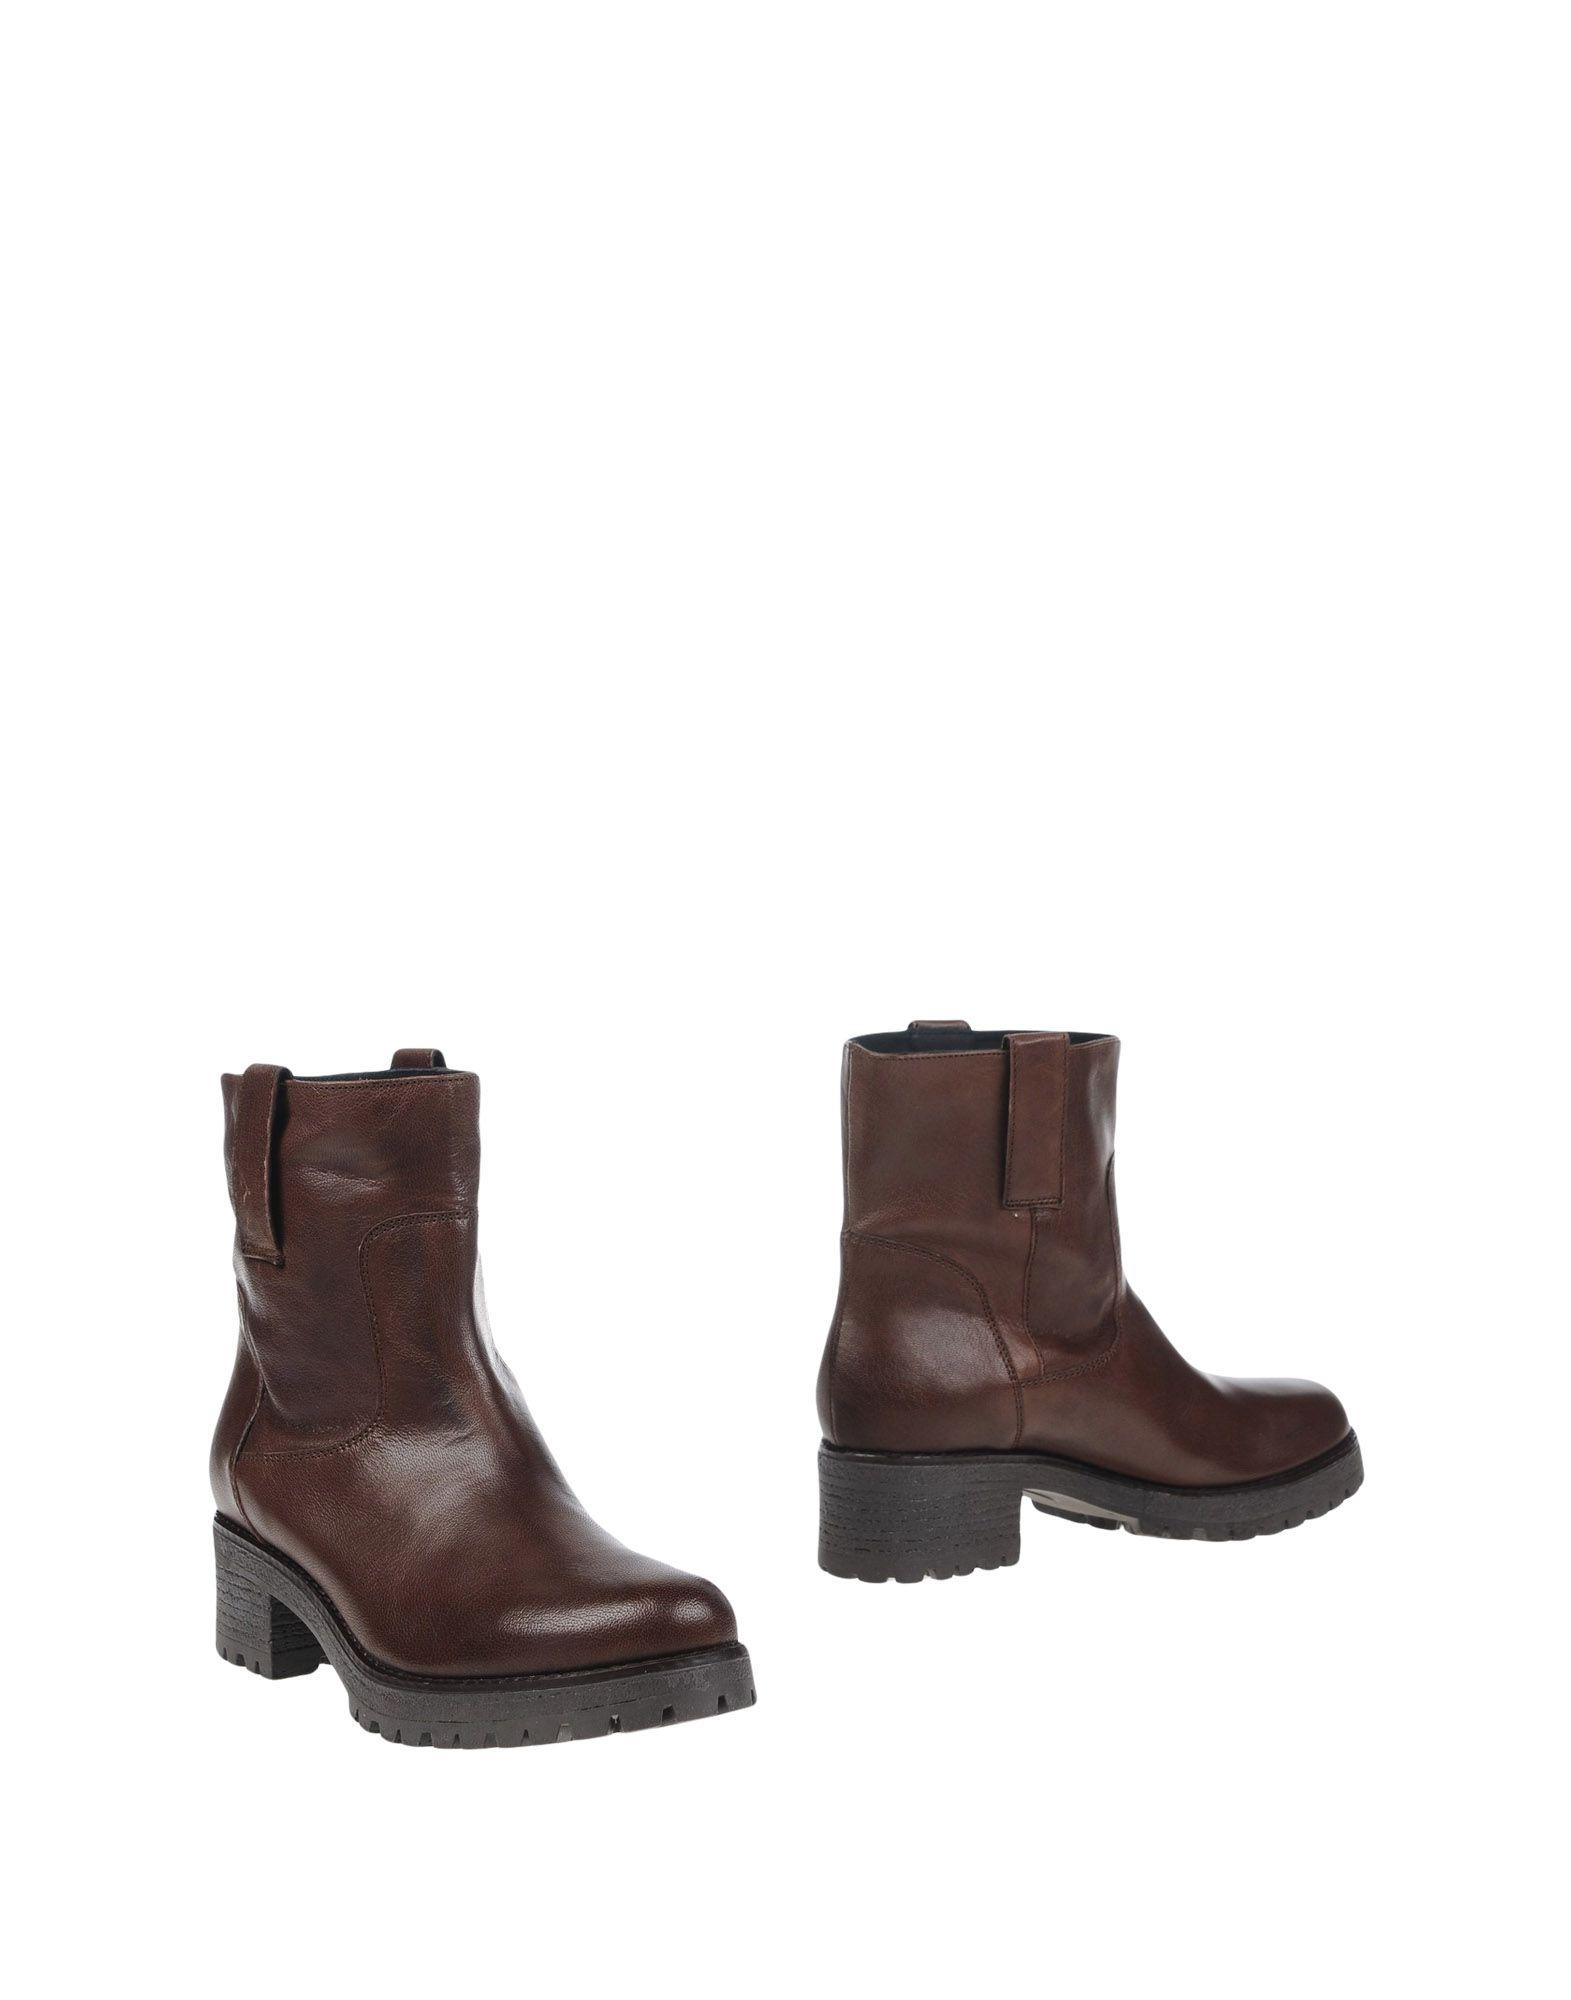 Stilvolle billige Schuhe P.A.R.O.S.H. Stiefelette Damen  11255689PB